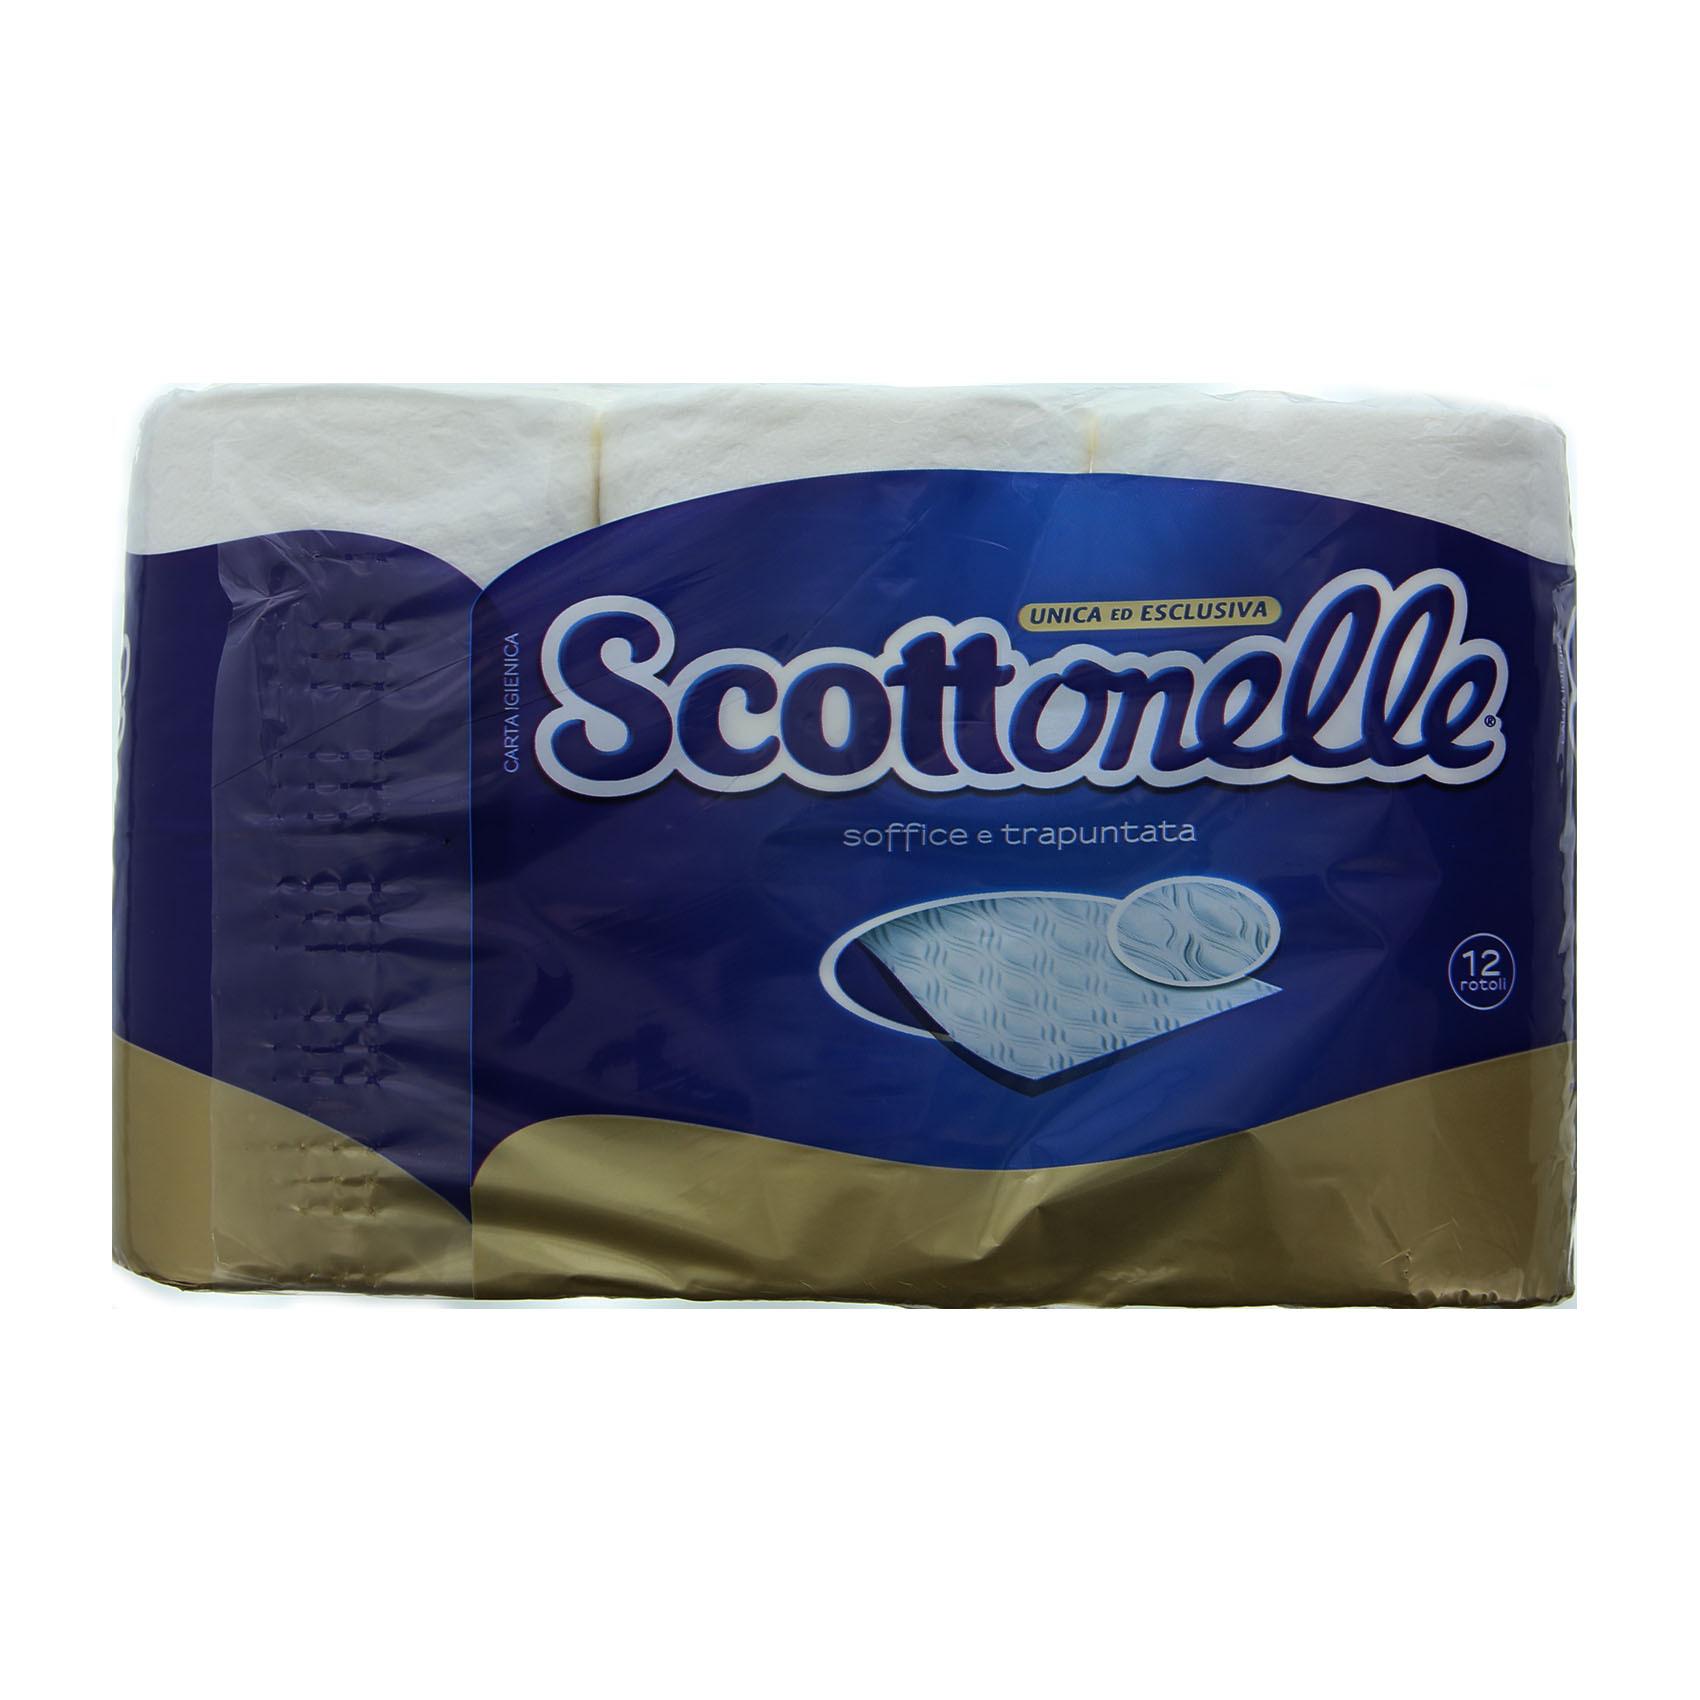 SCOTTONELLE T/ROLLS 12'S